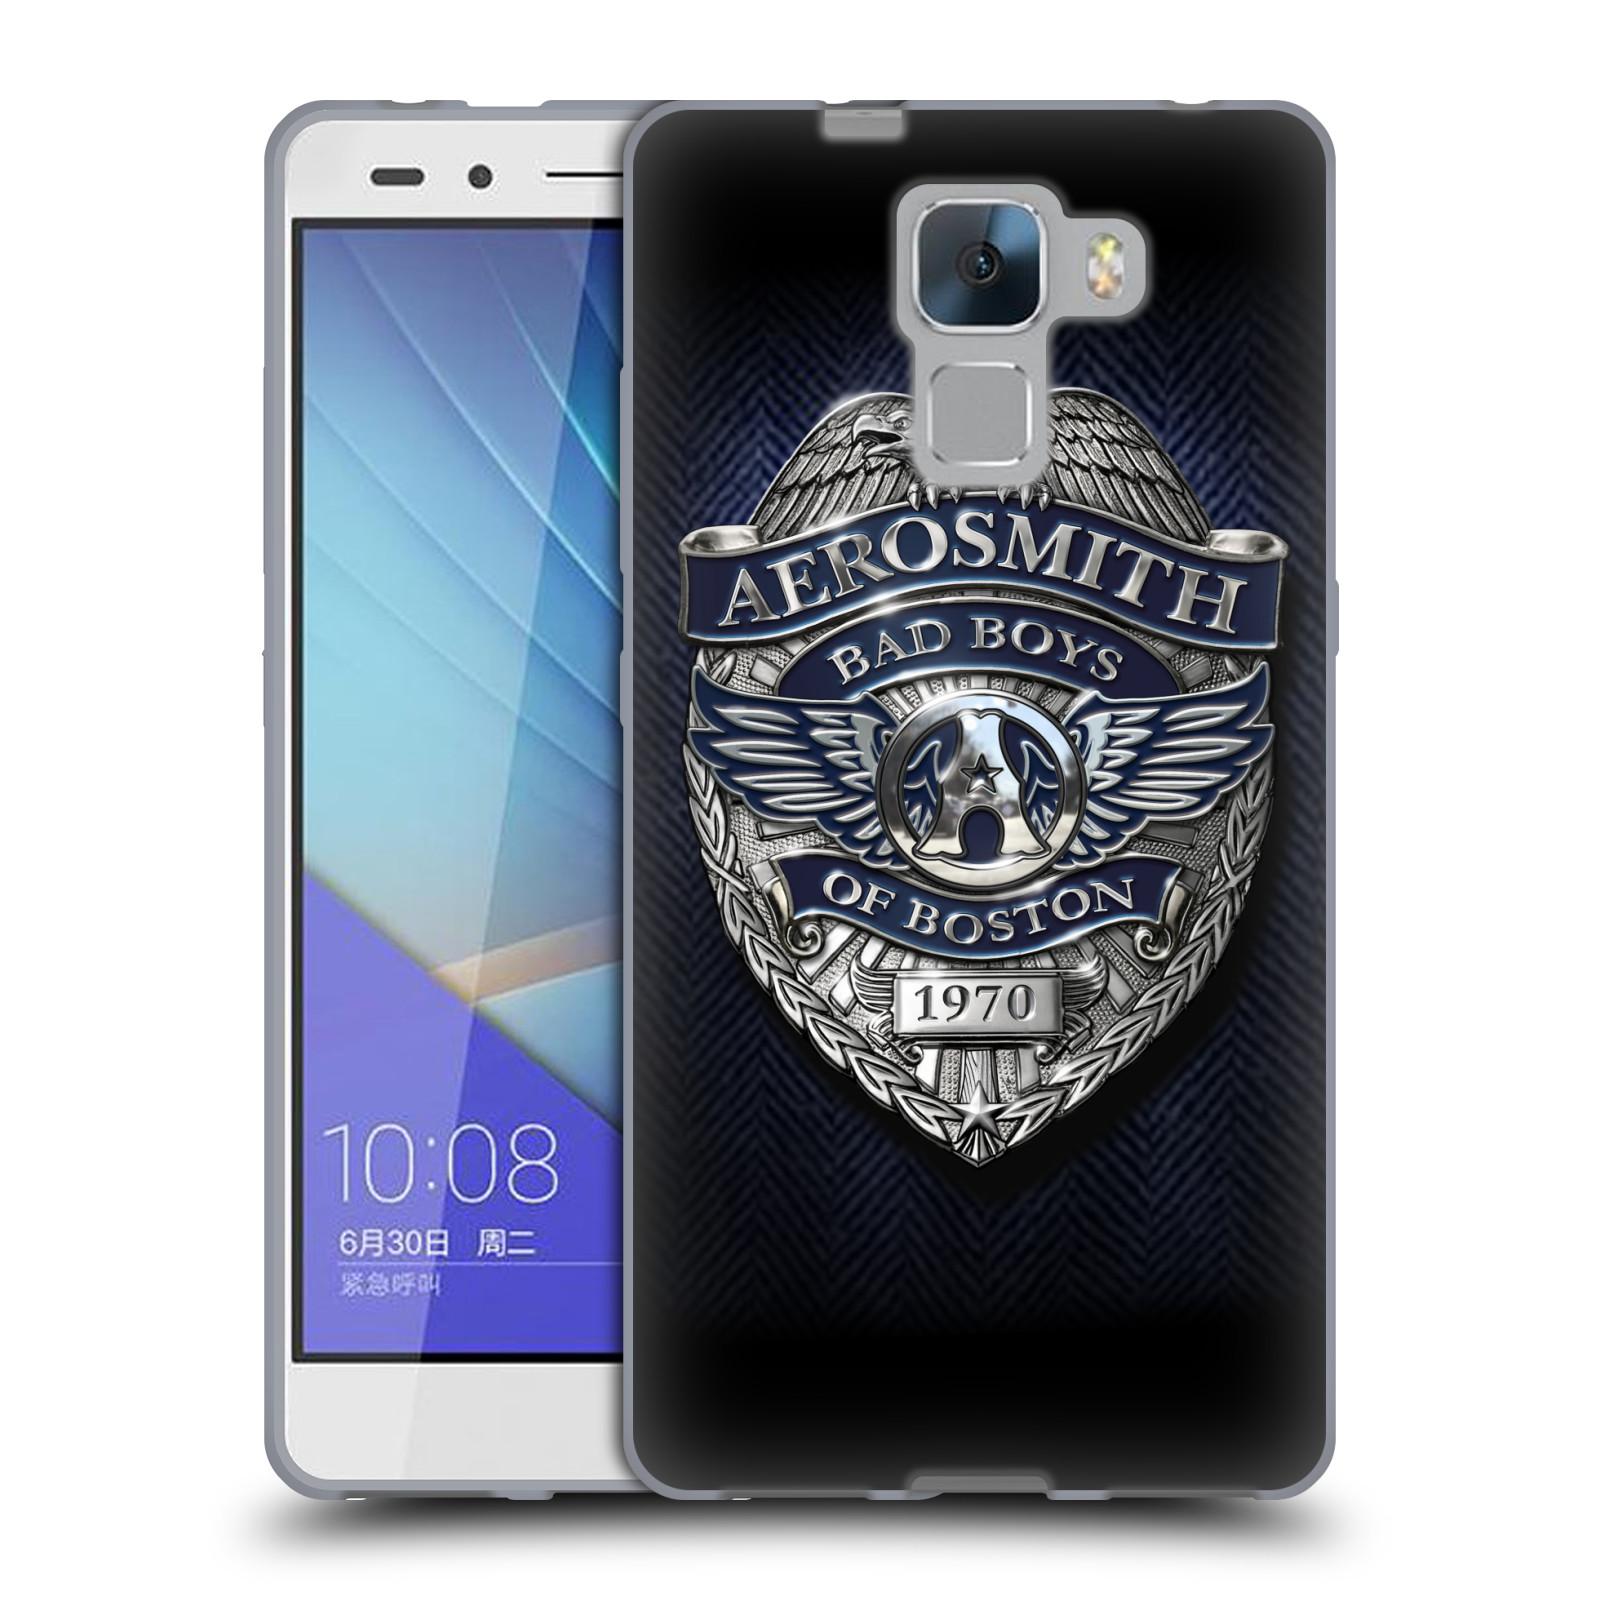 Silikonové pouzdro na mobil Honor 7 HEAD CASE - Aerosmith - Bad Boys of Boston